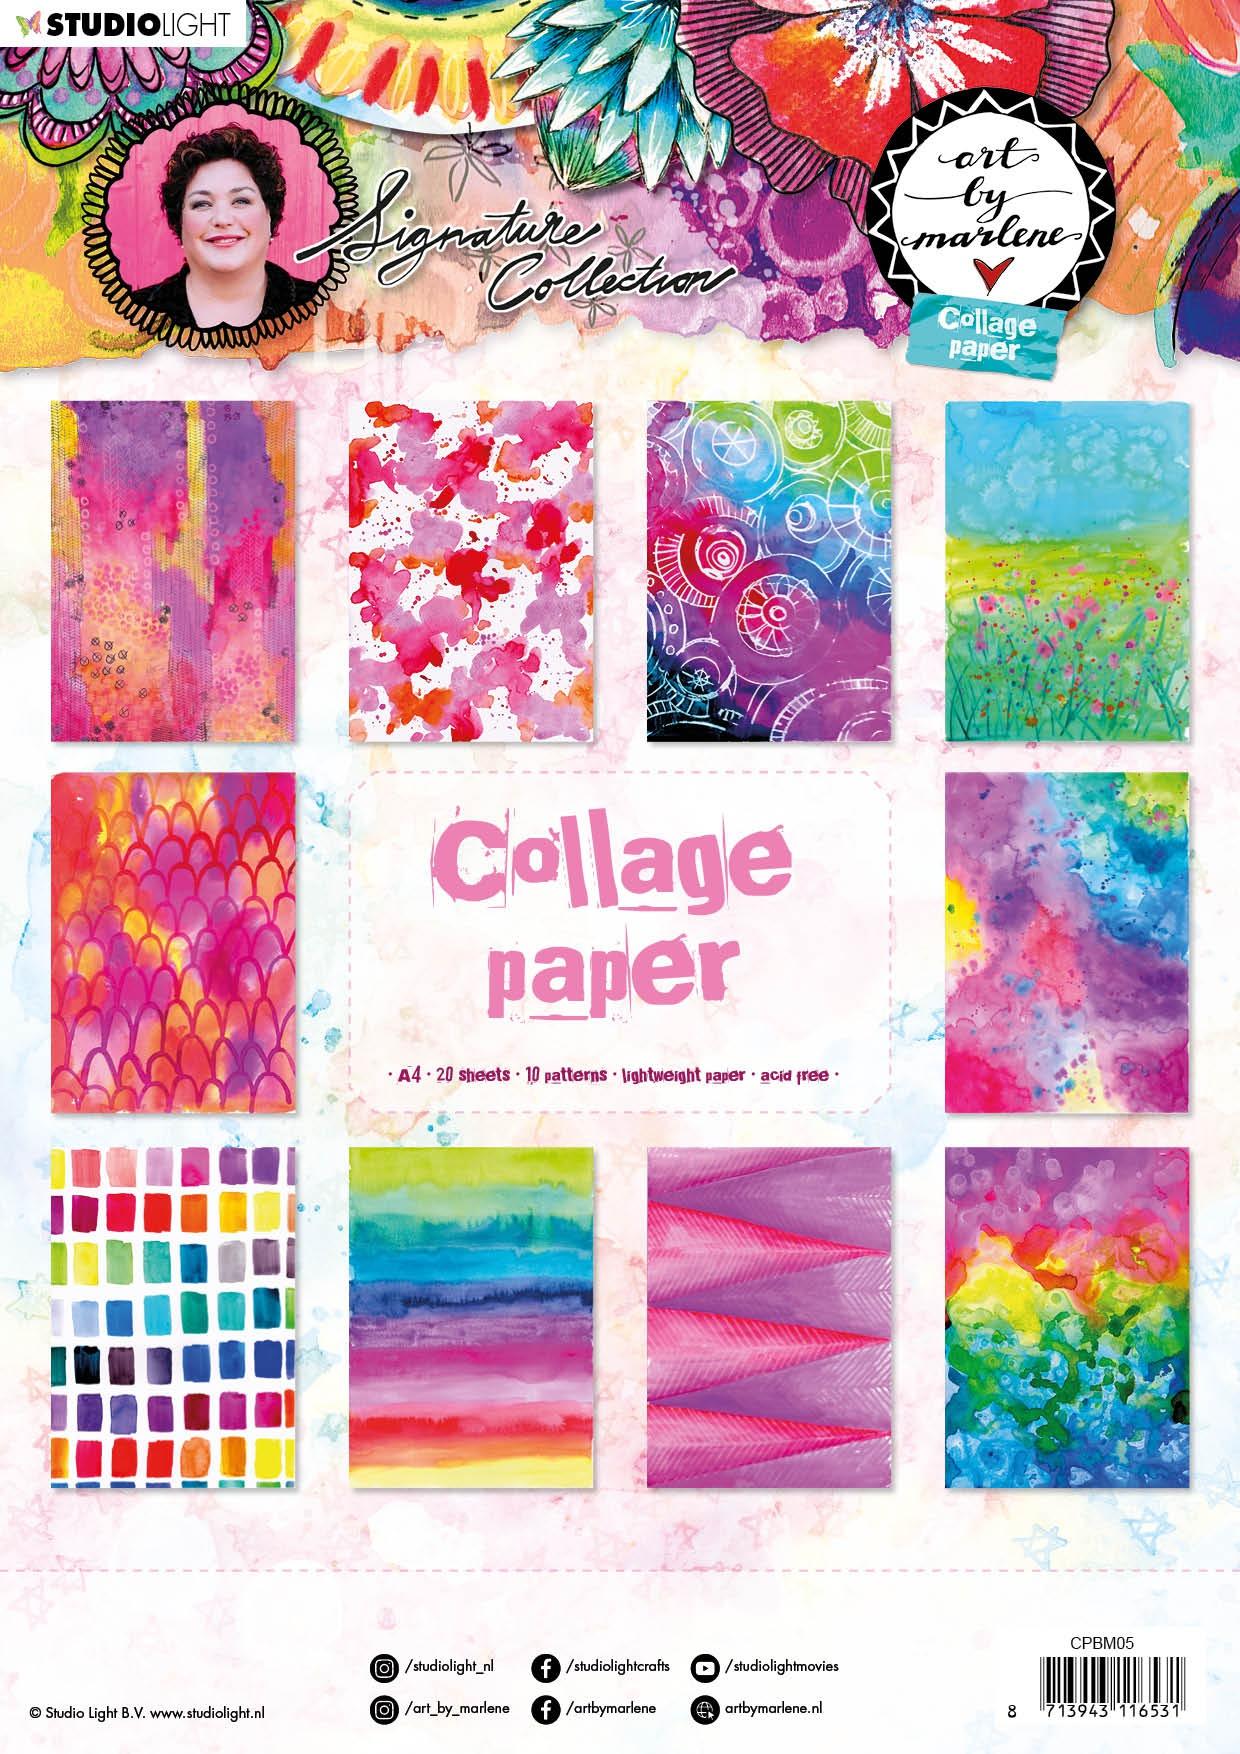 Art By Marlene 5.0 Collage Paper A4 20/Pkg-NR. 05, 10 Designs/2 Each